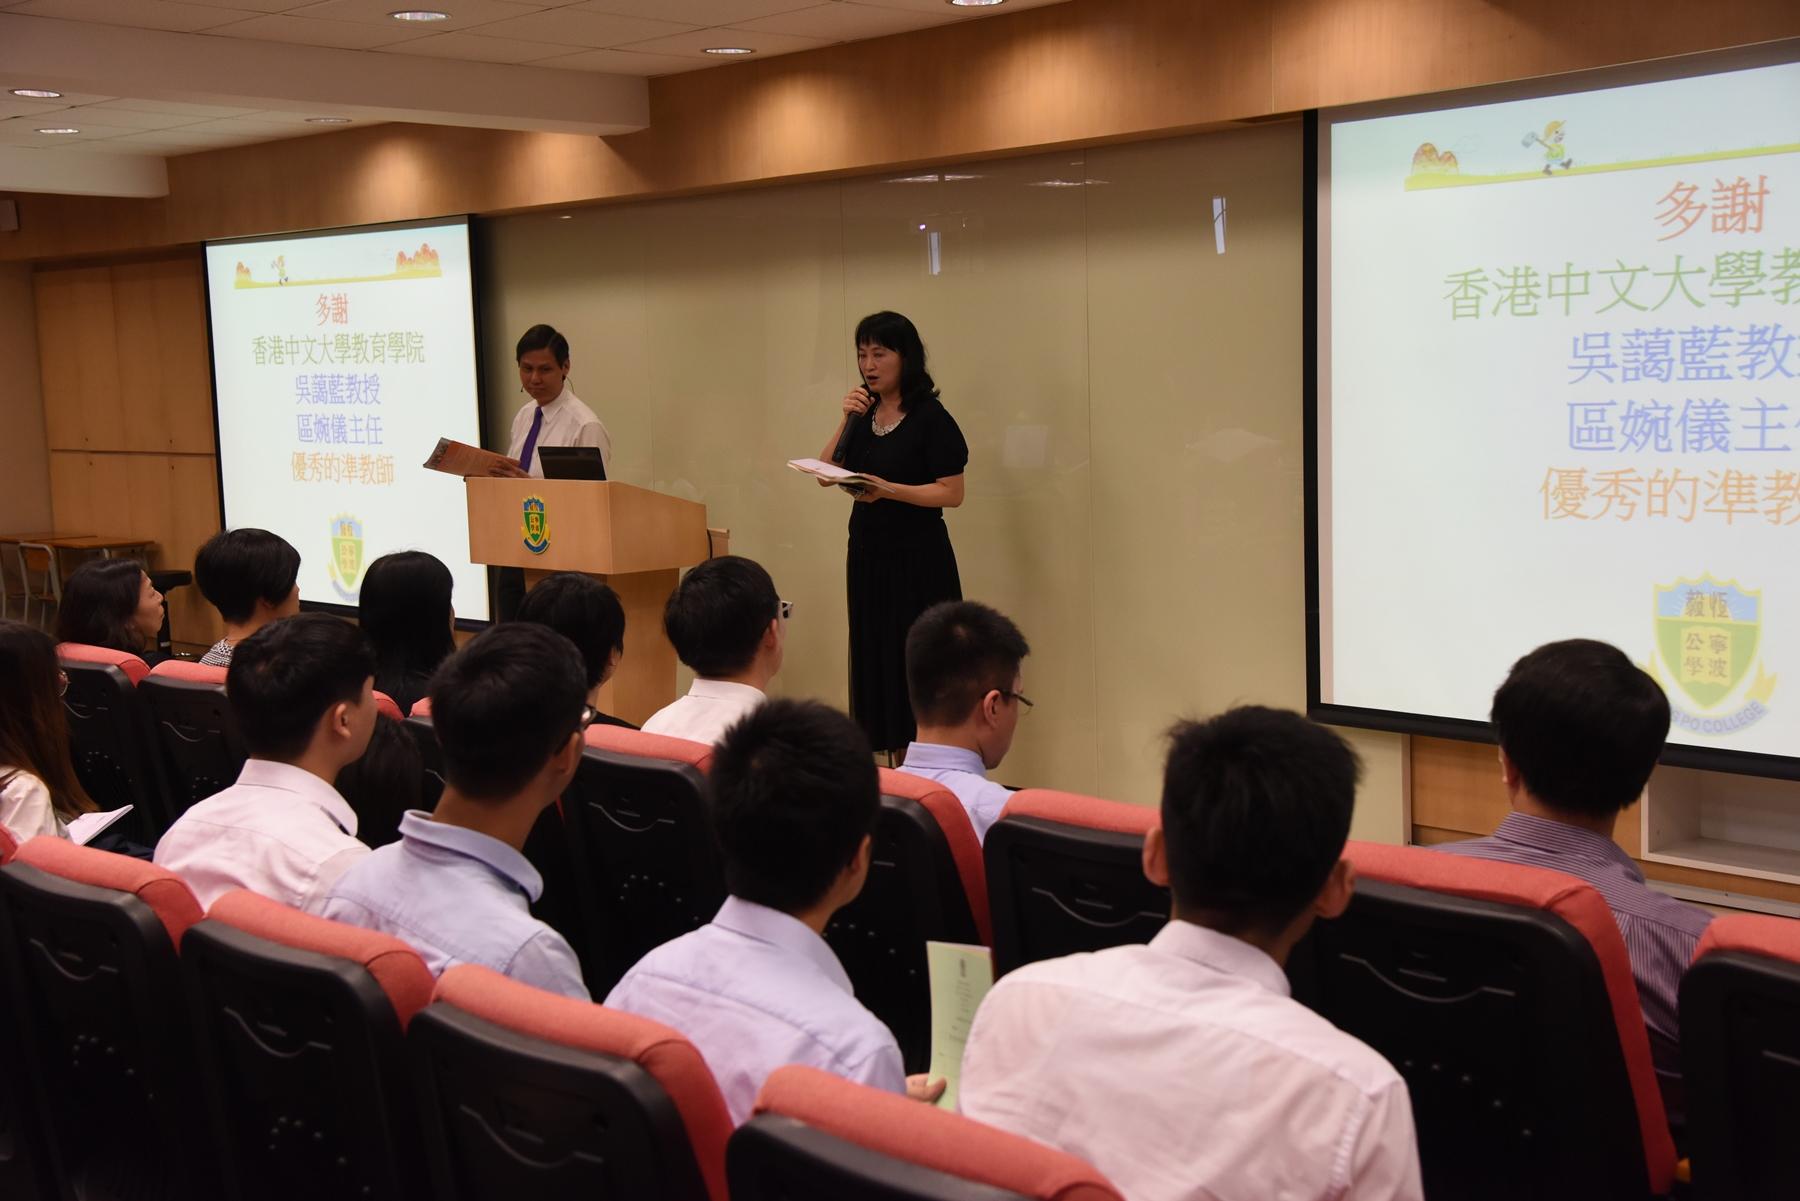 http://npc.edu.hk/sites/default/files/dsc_0621_1.jpg